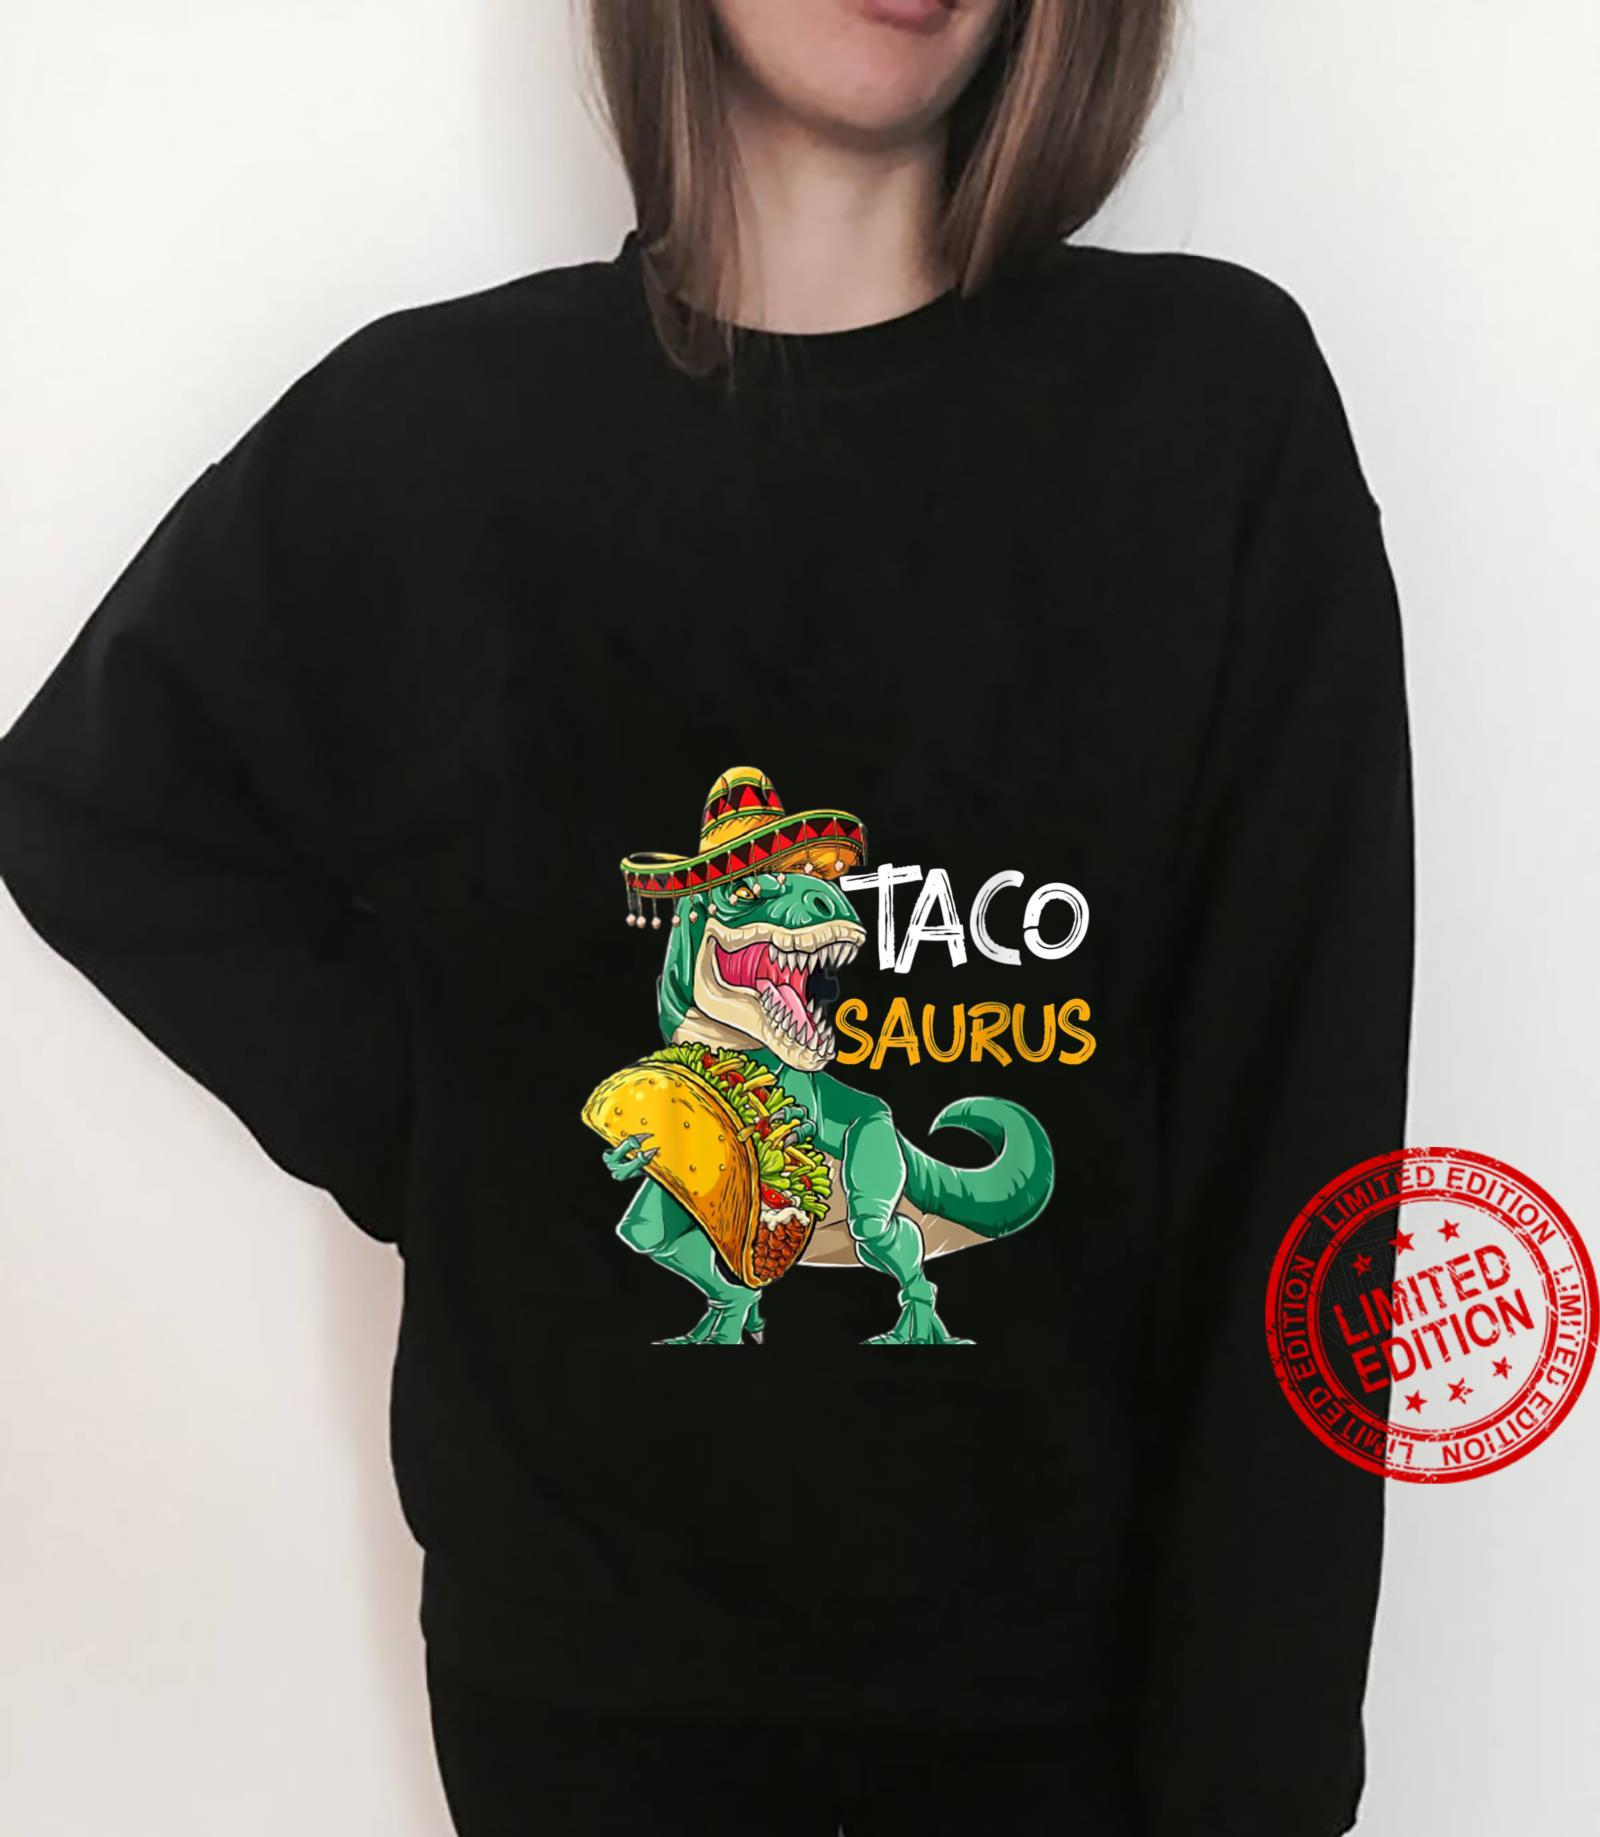 Womens Tacosaurus Cinco de Mayo Shirt Taco Dinosaur Shirt sweater